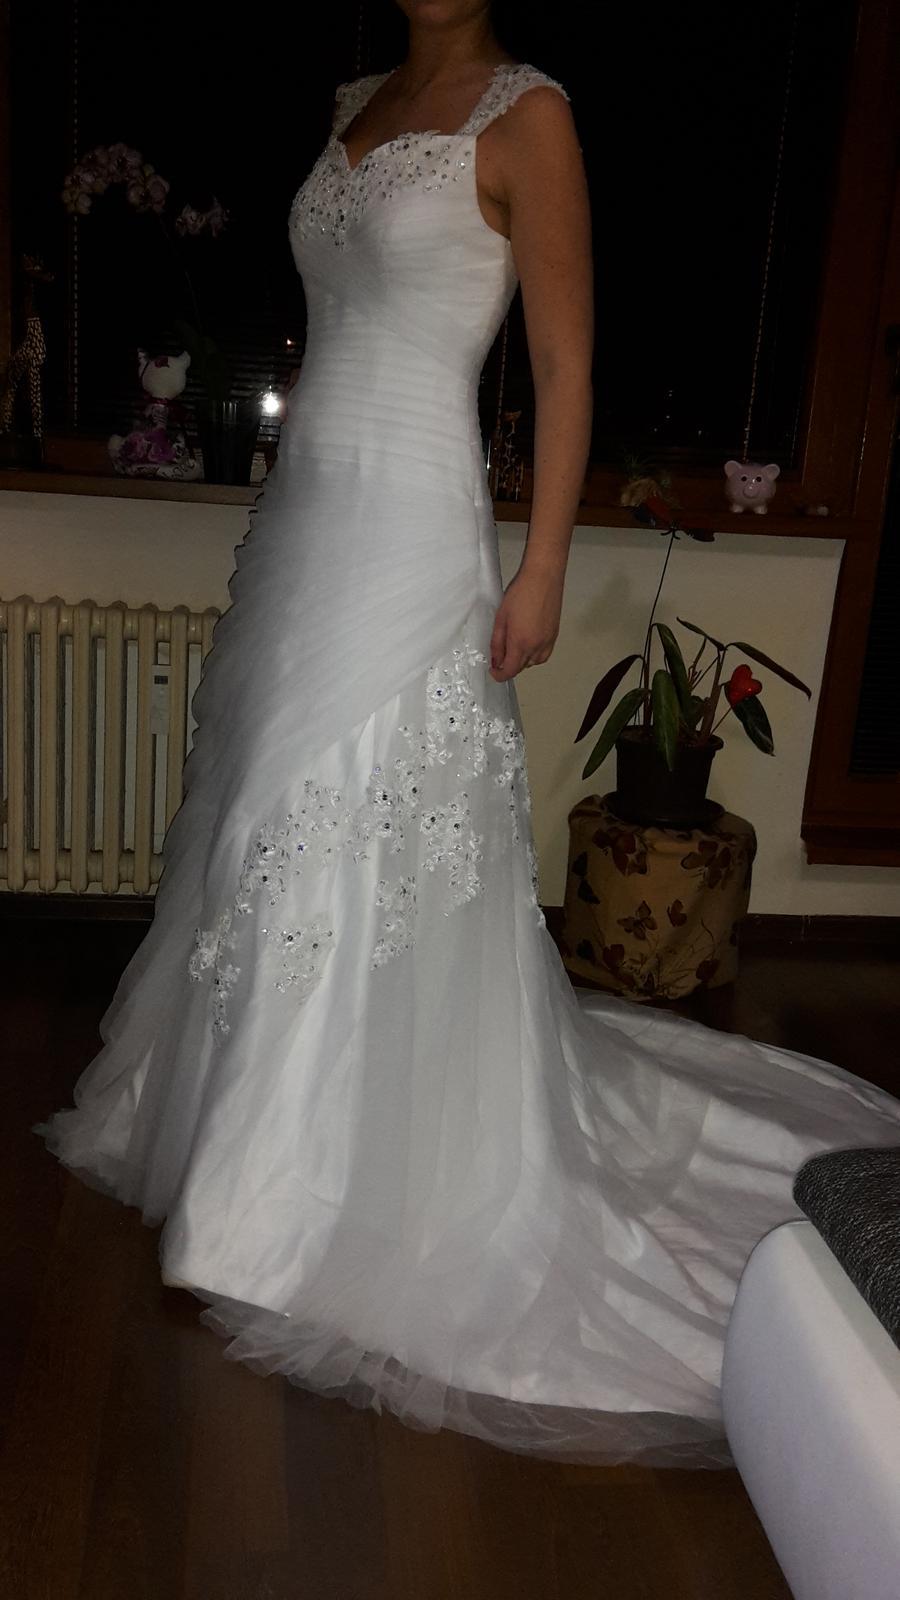 Svadobné šaty (nové) - Obrázok č. 3